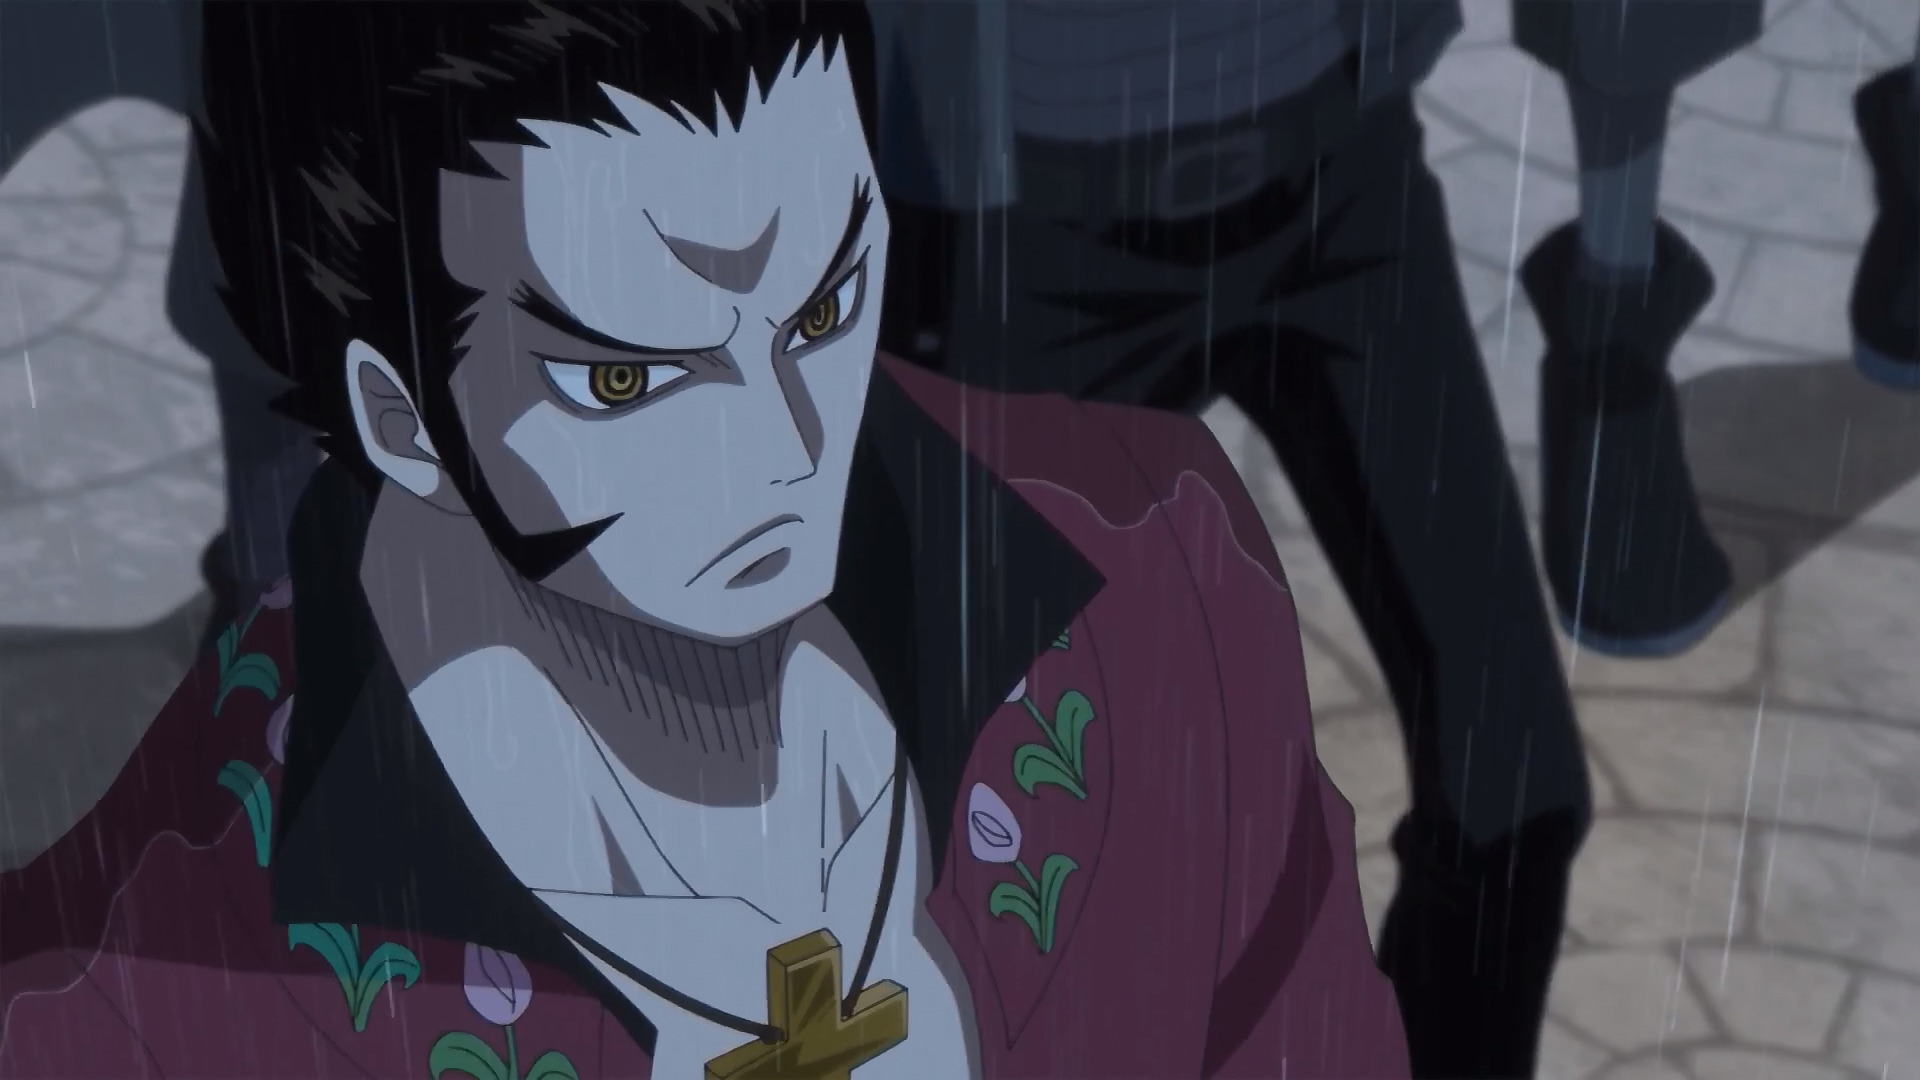 Mihawk Dracule / Аниме и манга / Форум Шикимори